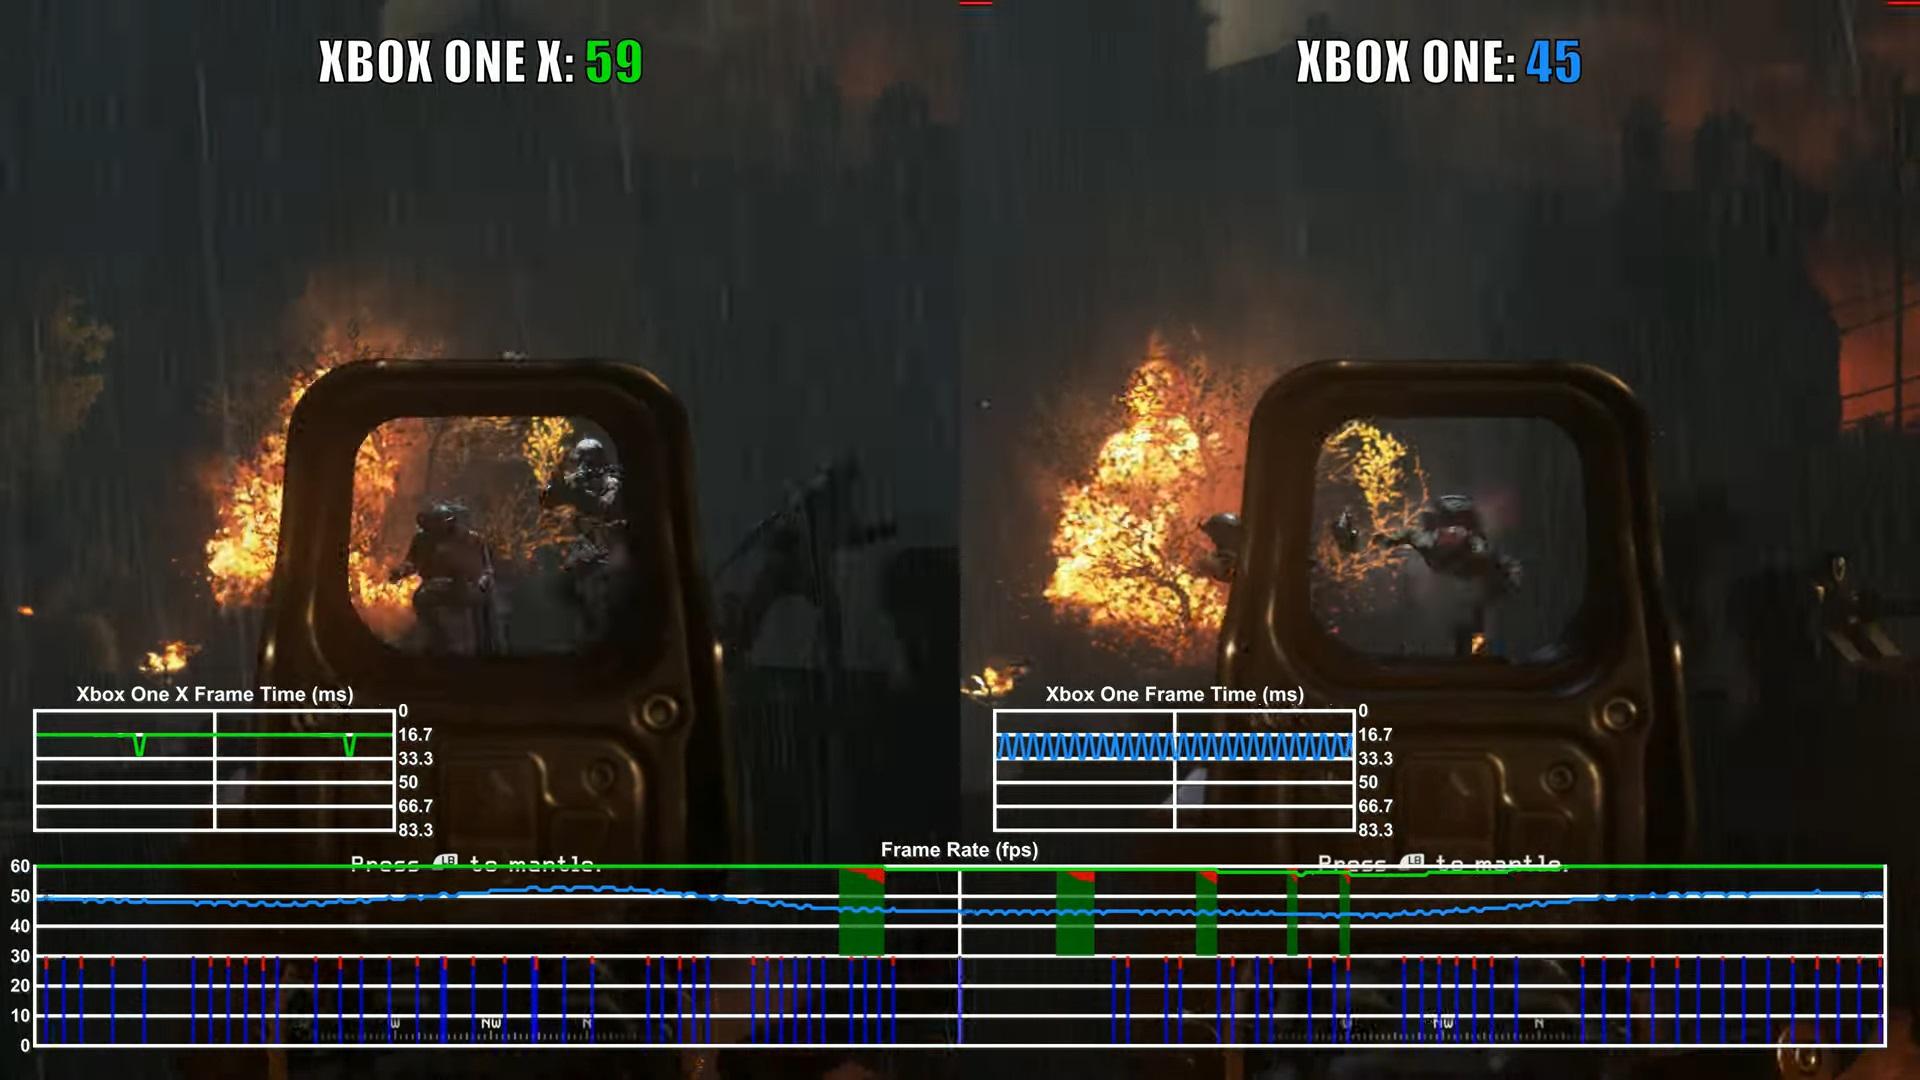 mwcoTzJ - 「CoD:MW2リマスター」Xbox One X版をPS4 Proと全く同じグラフィックにしてしまい、メディアから酷評